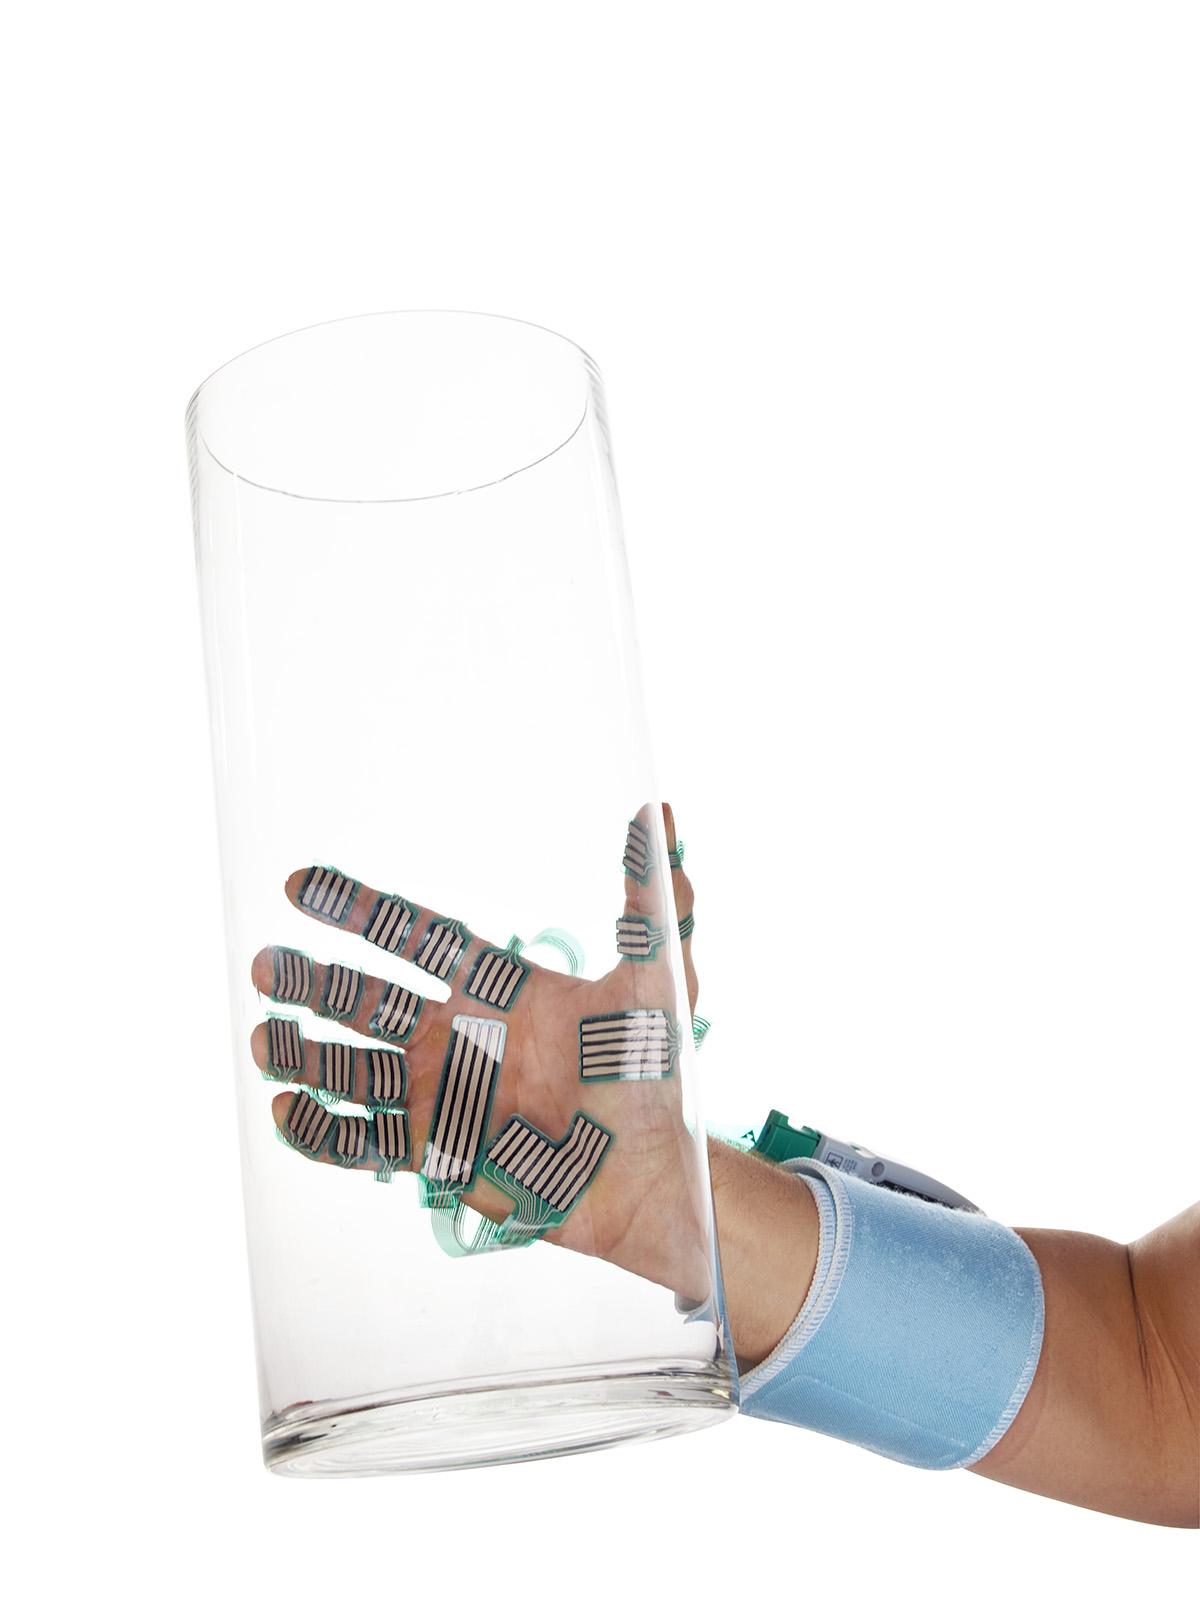 Grip Pressure Grip System Tekscan